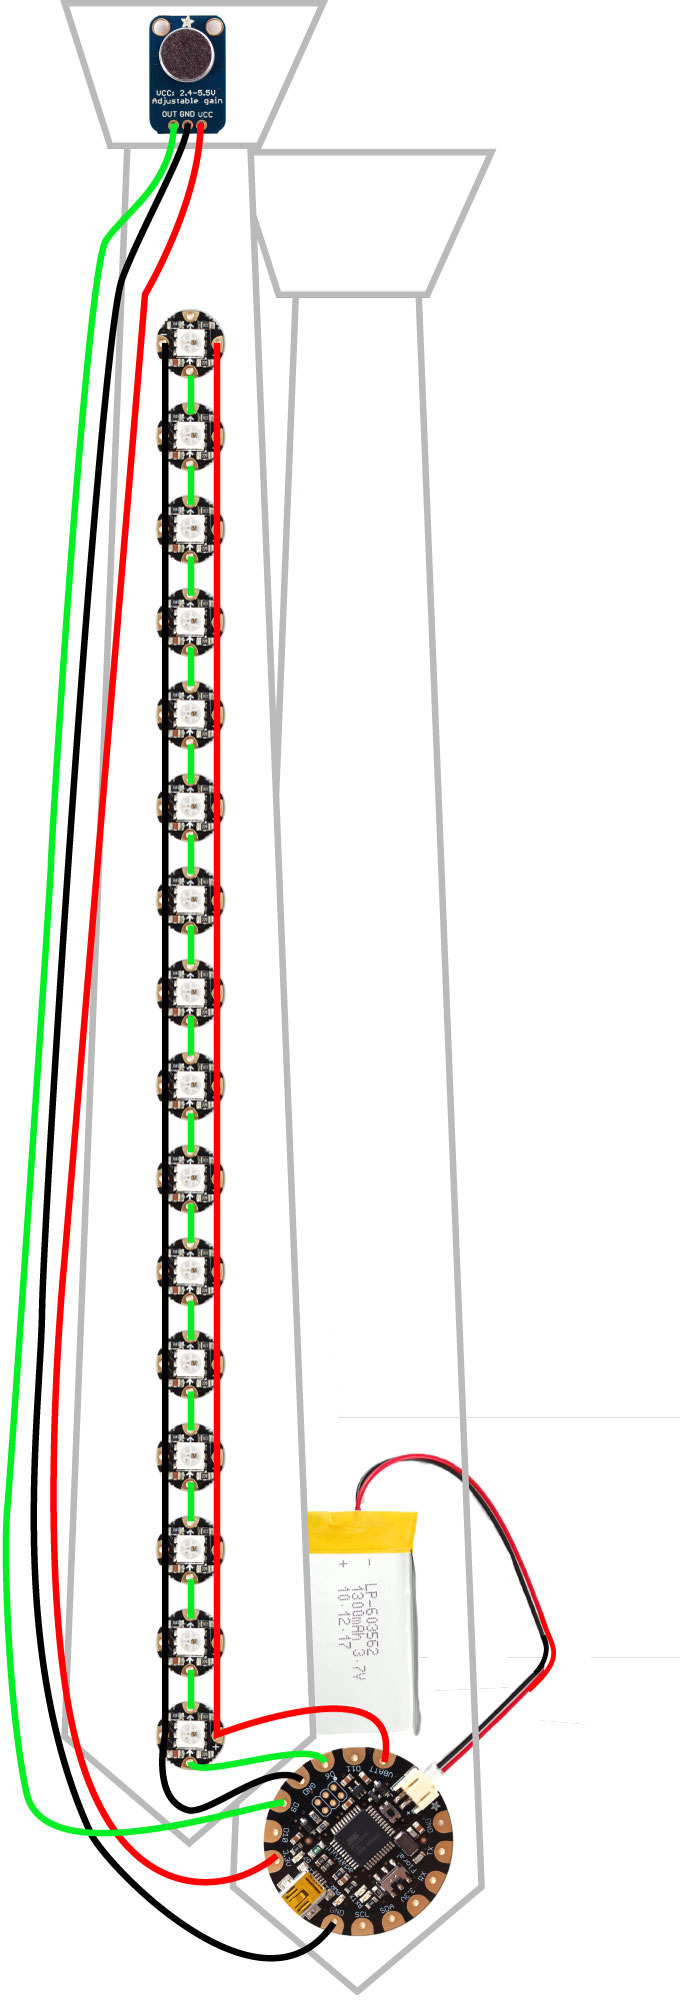 flora_pixel-tie-diagram.jpg